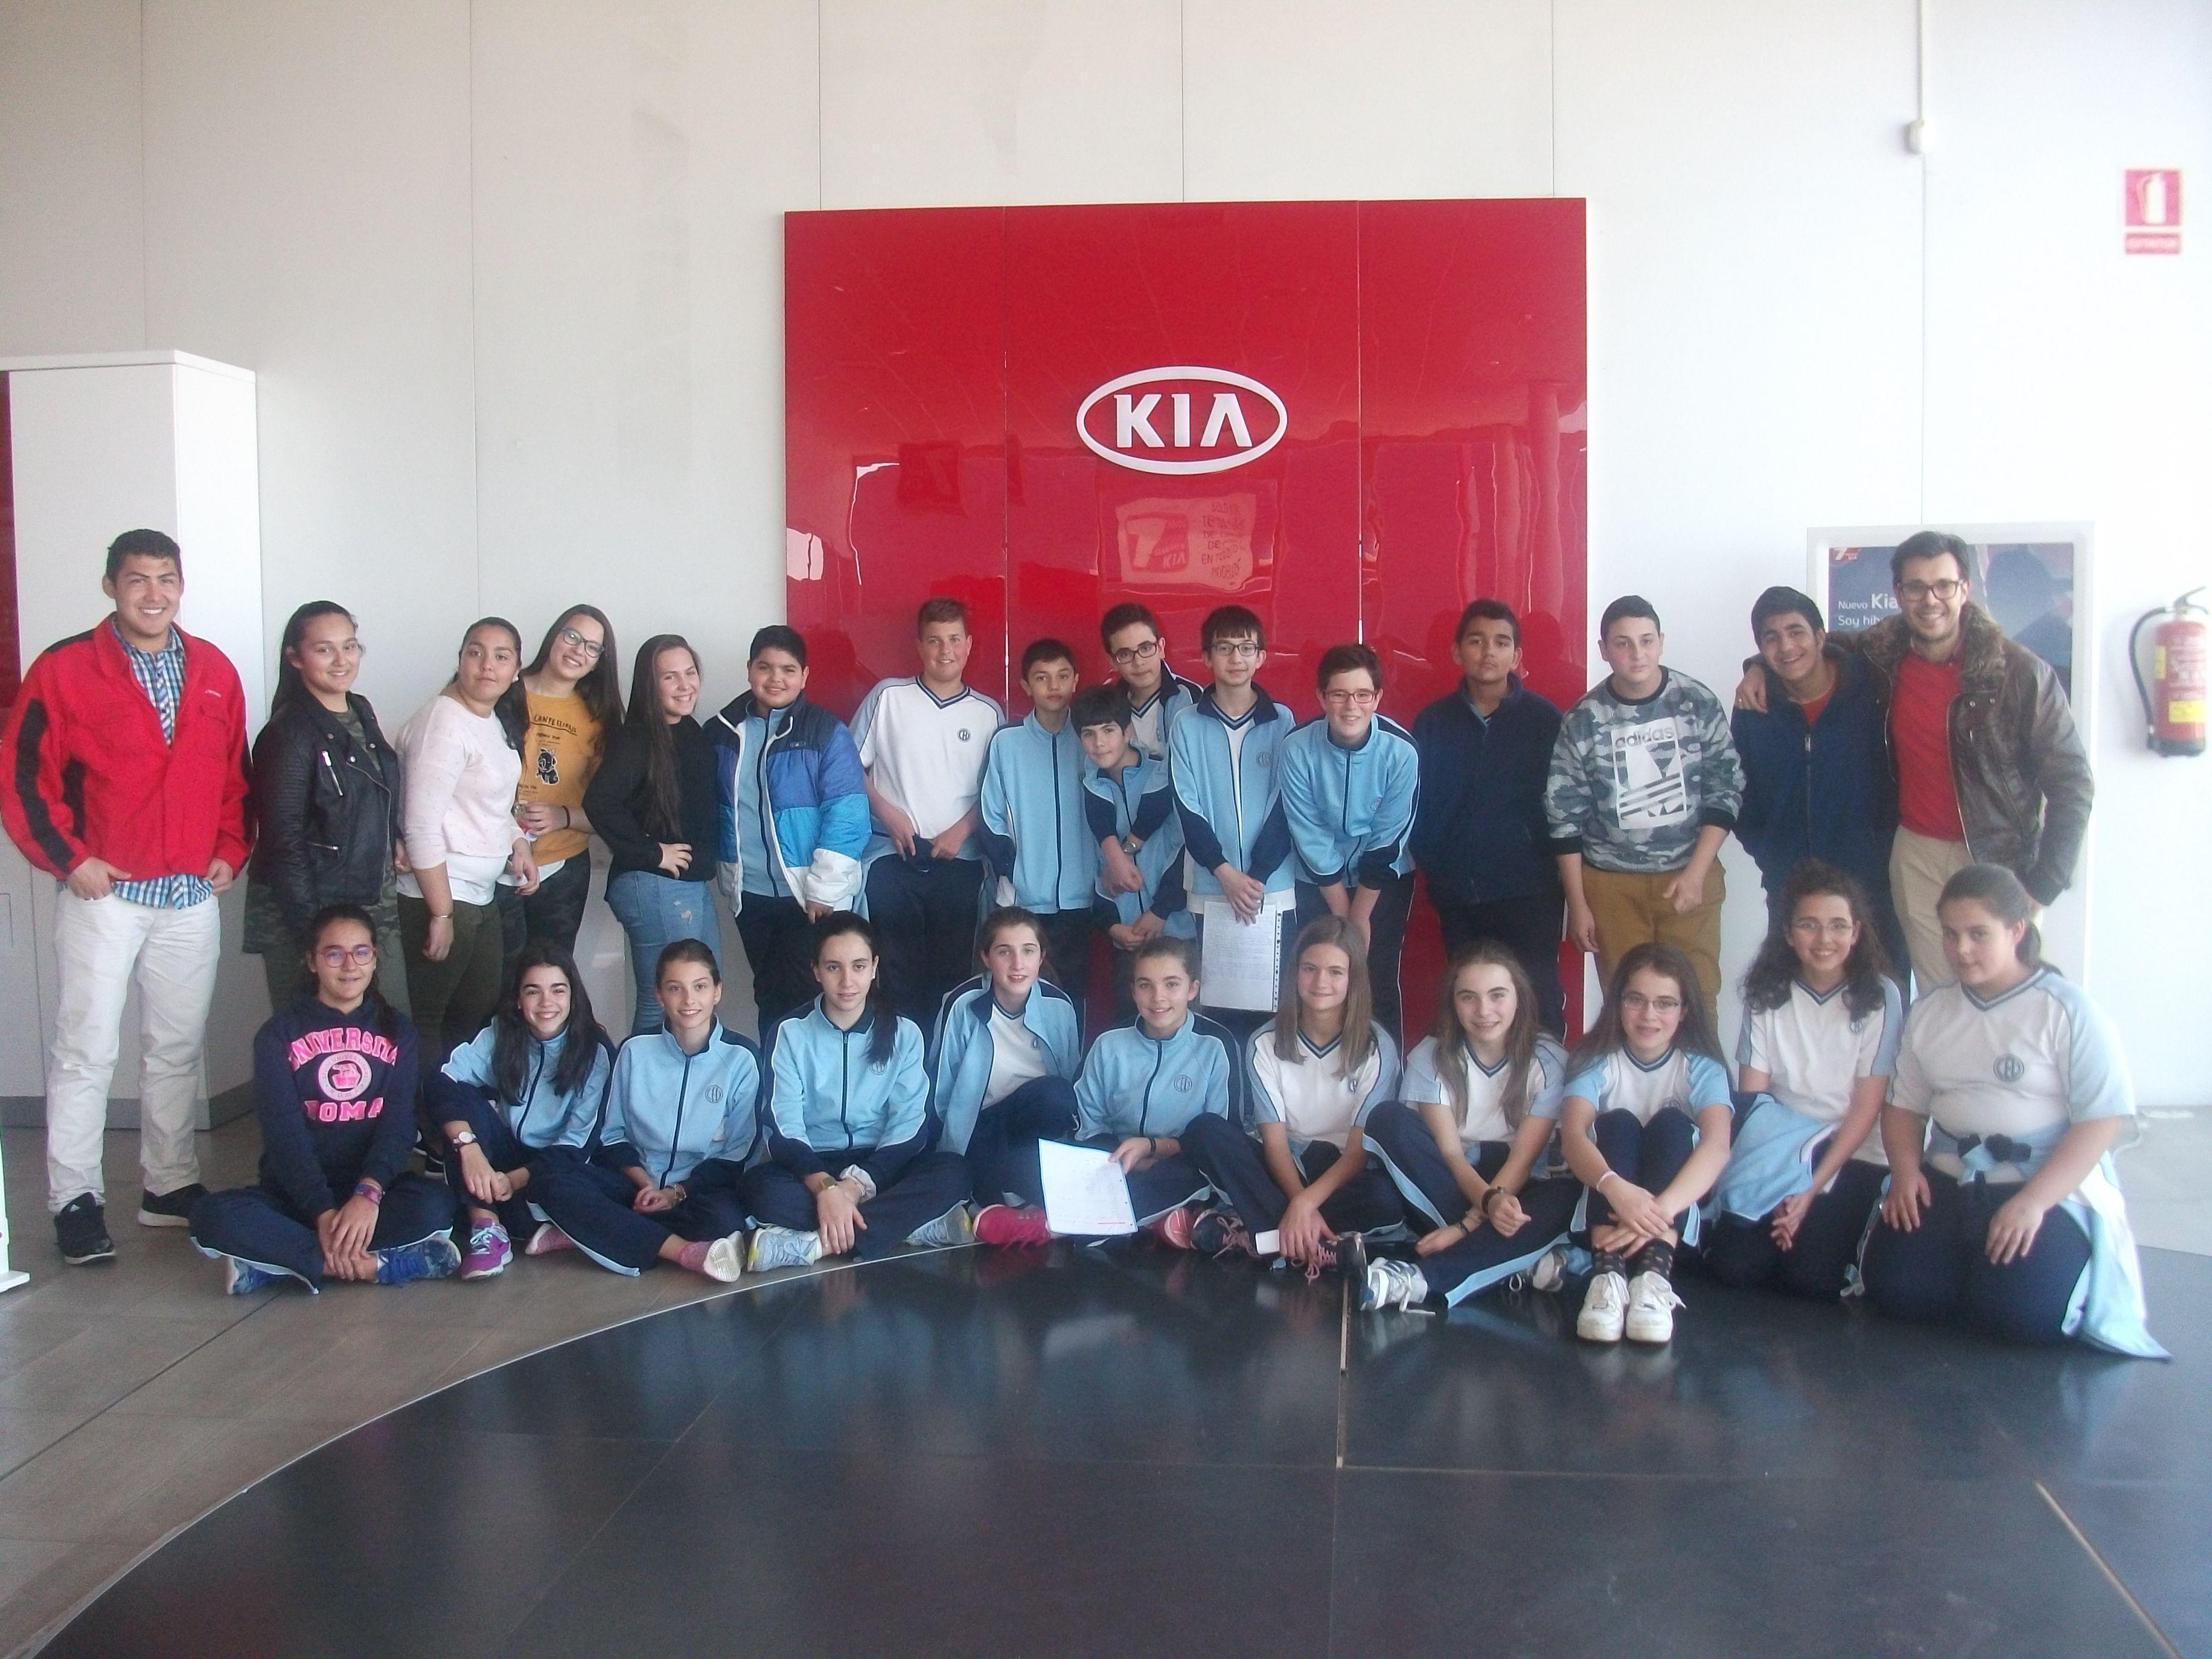 Alumnos de 1º de la E.S.O de SAN VICENTE DE PAUL